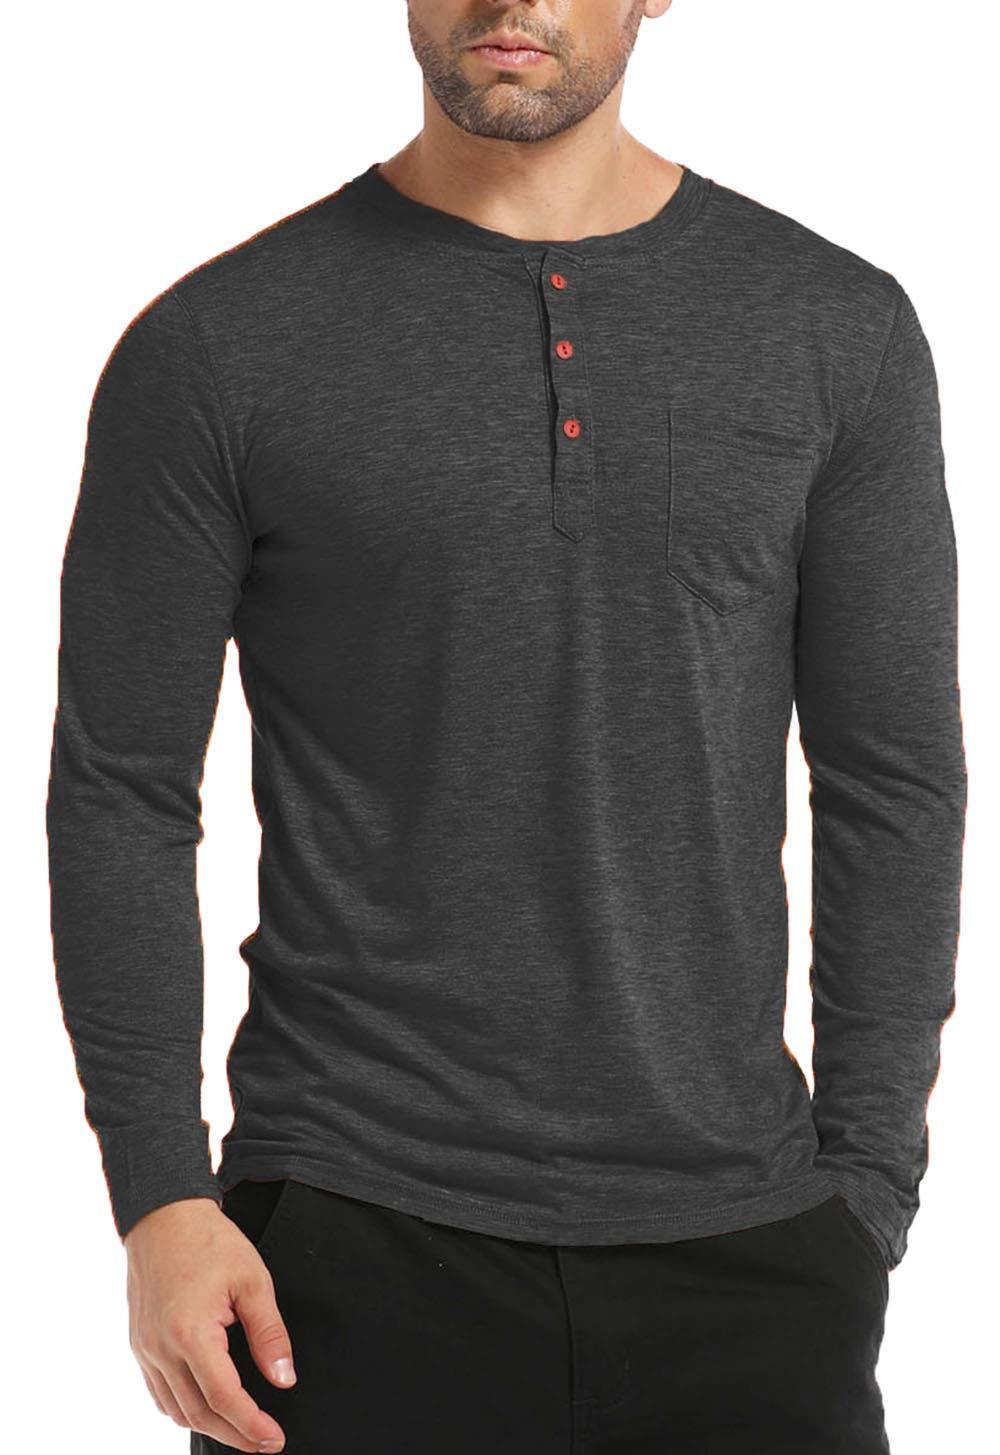 BABEIYXM Men's Henley Long Sleeve Shirts Soild Tee Shirts Front Pocket Tops Basic T-Shirts,Gray,M